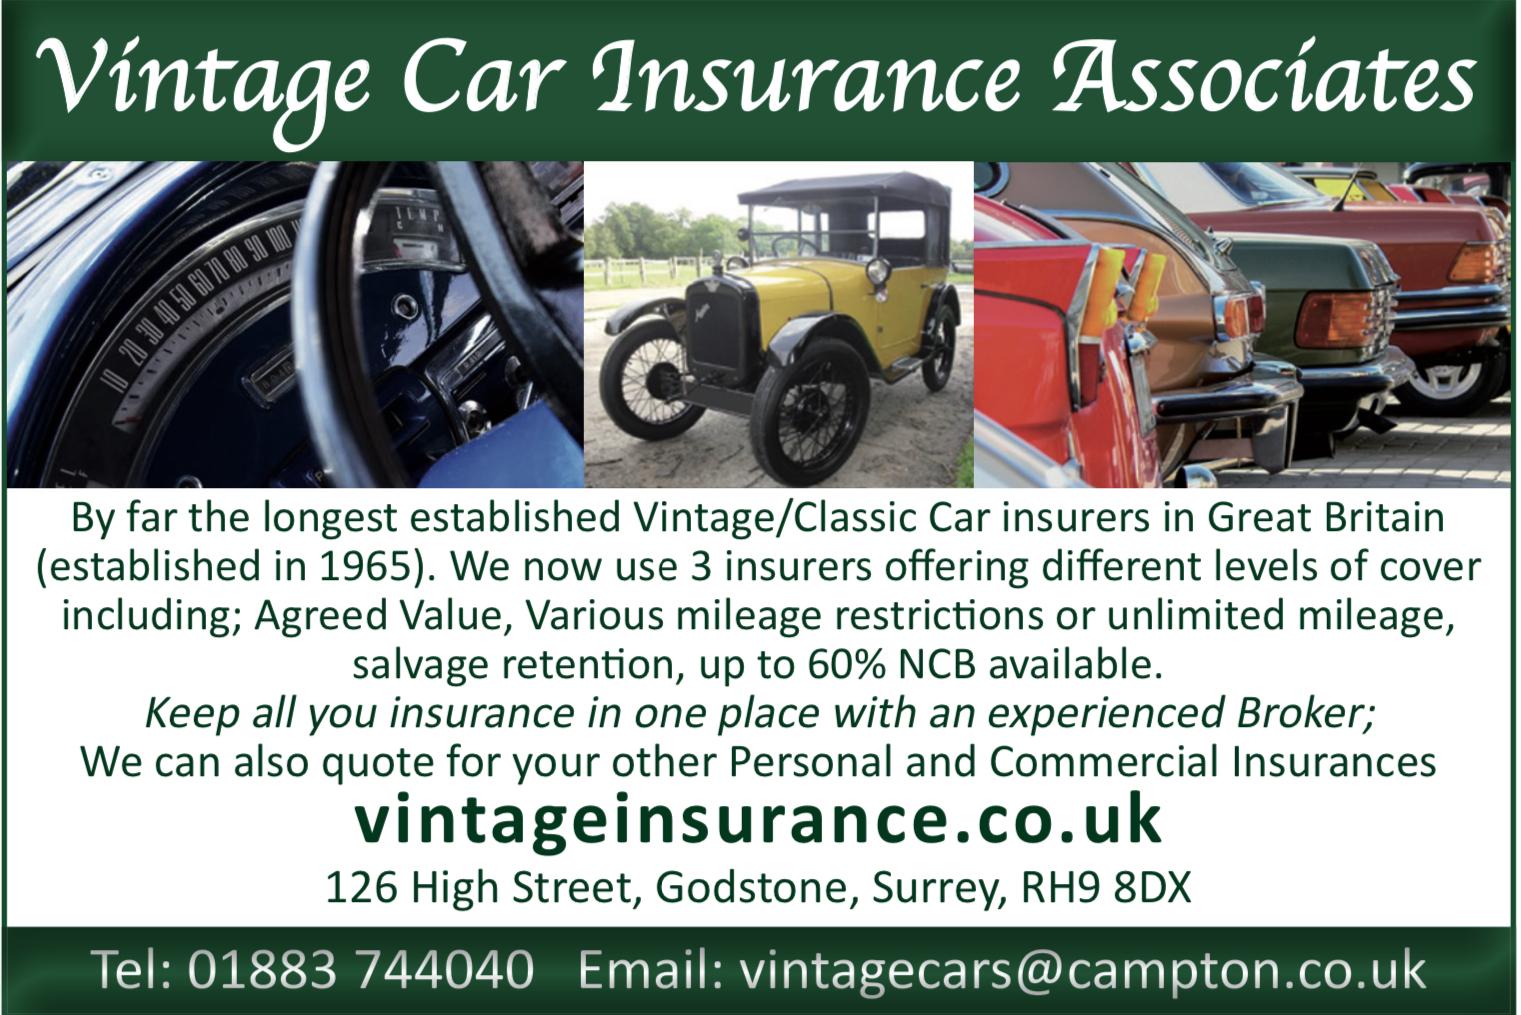 Vintage Car Insurance Associates  - Vintage & Classic Car insurance broker